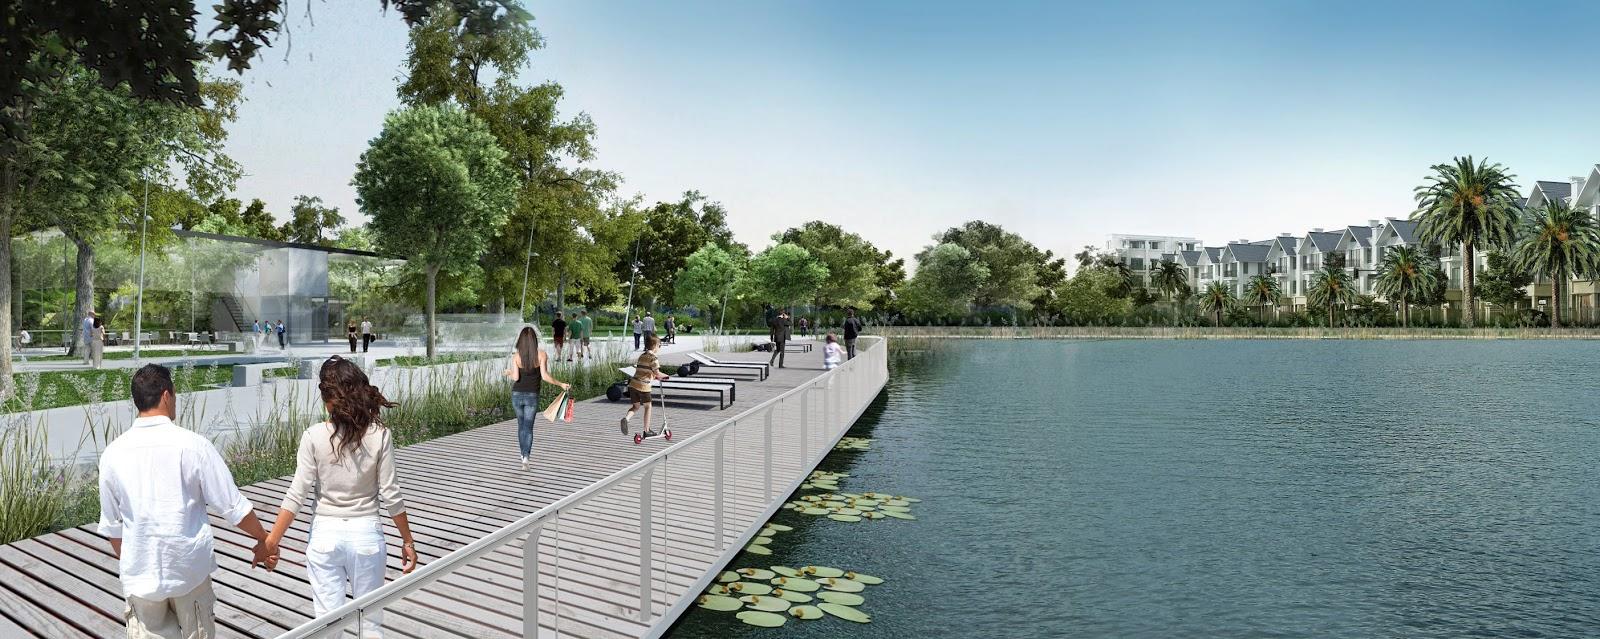 tien-ich-flc-premier-park